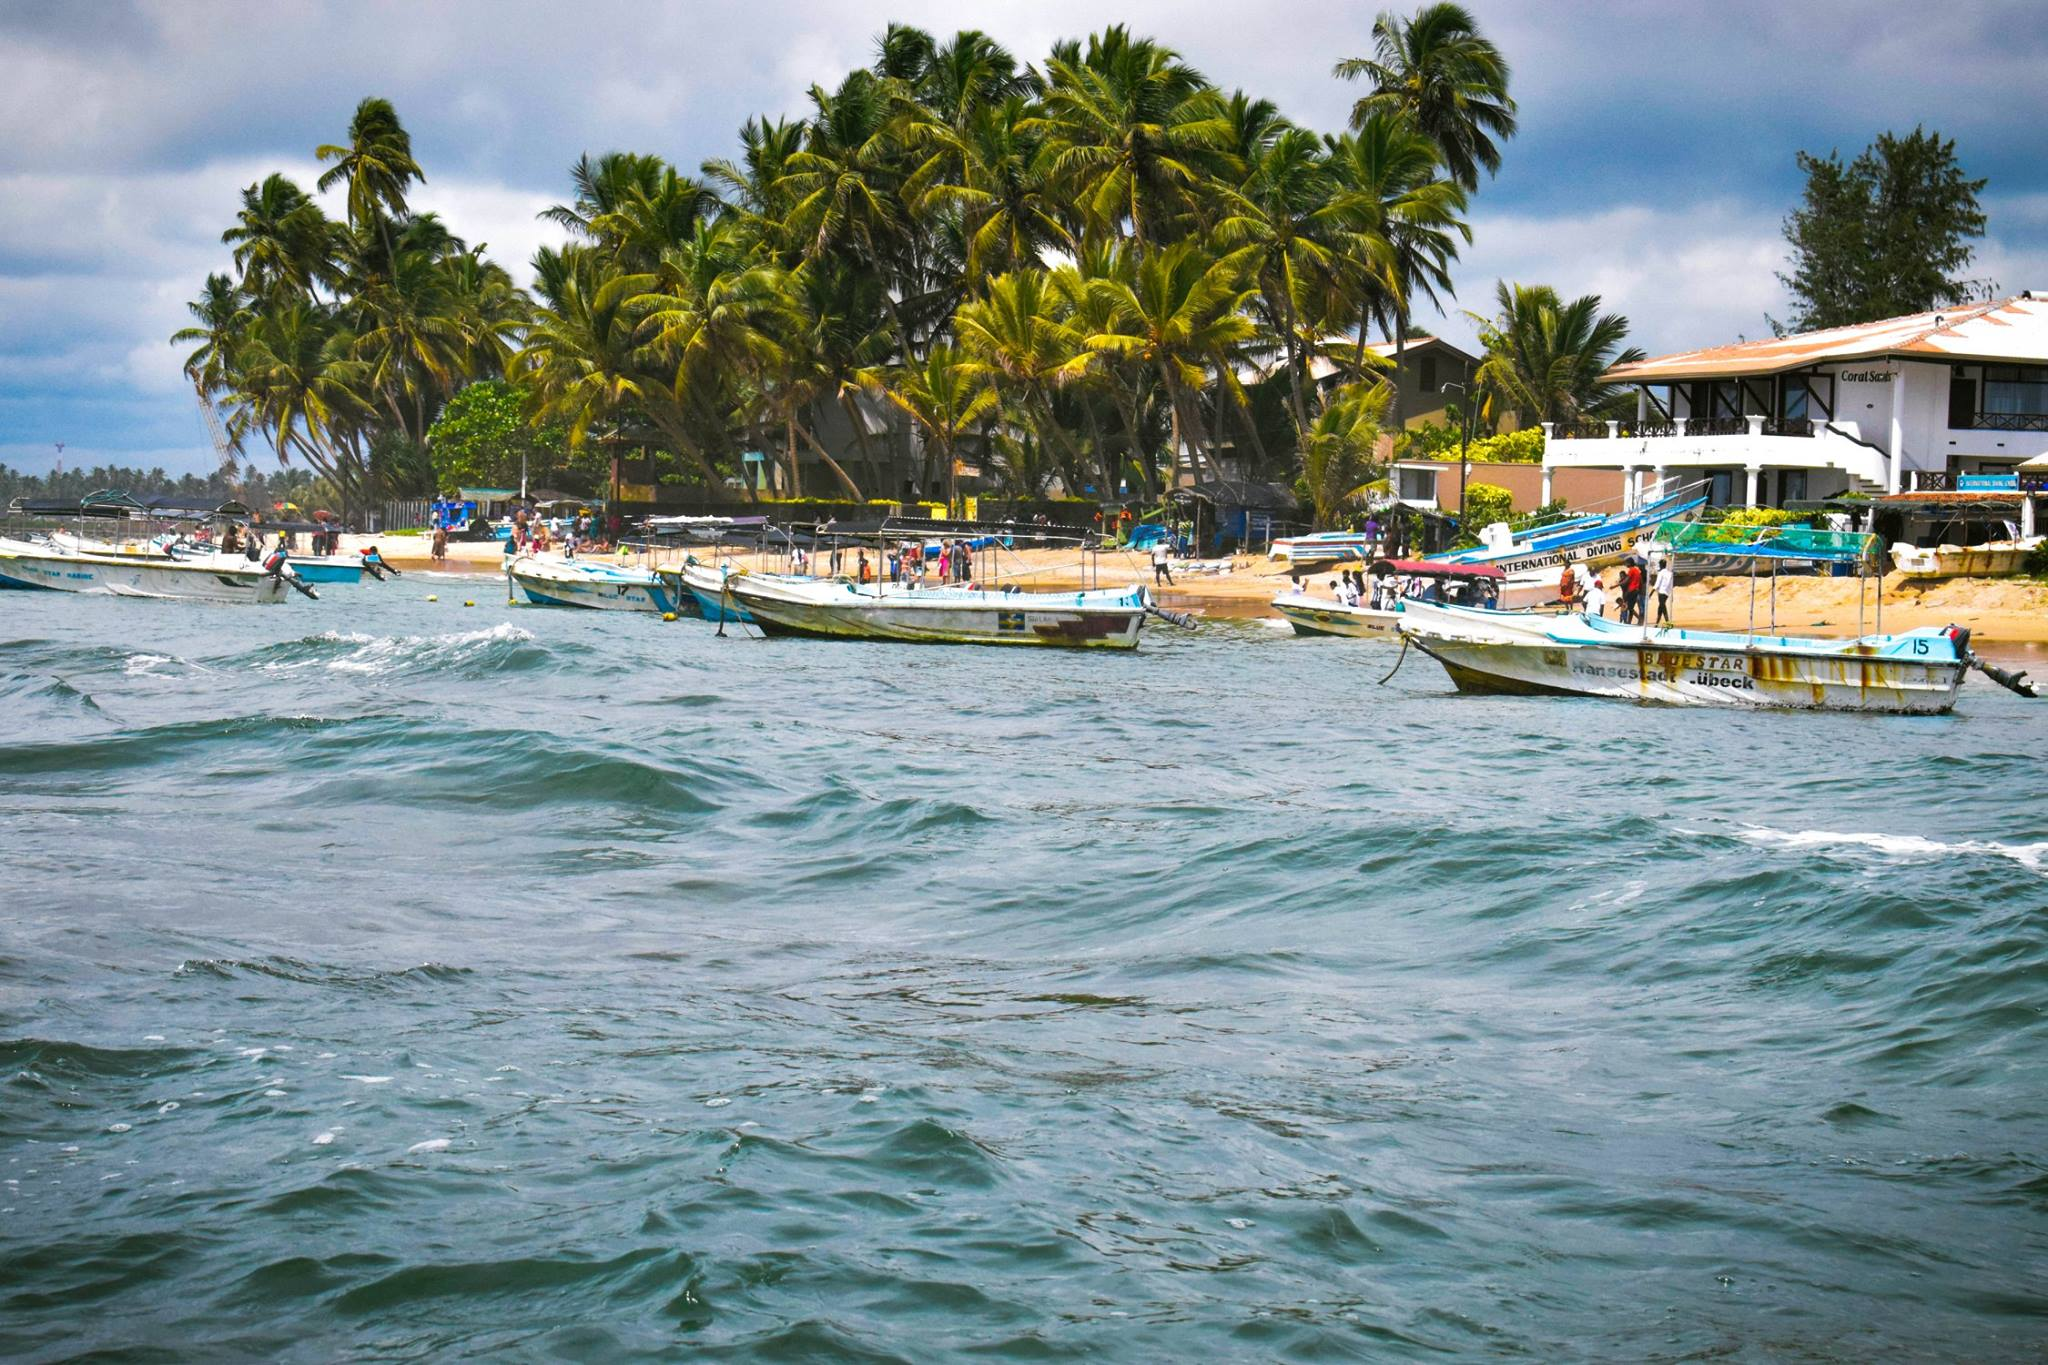 Sri Lanka Hikkaduwa Beach That Offer Gorgeous Sandy Shores